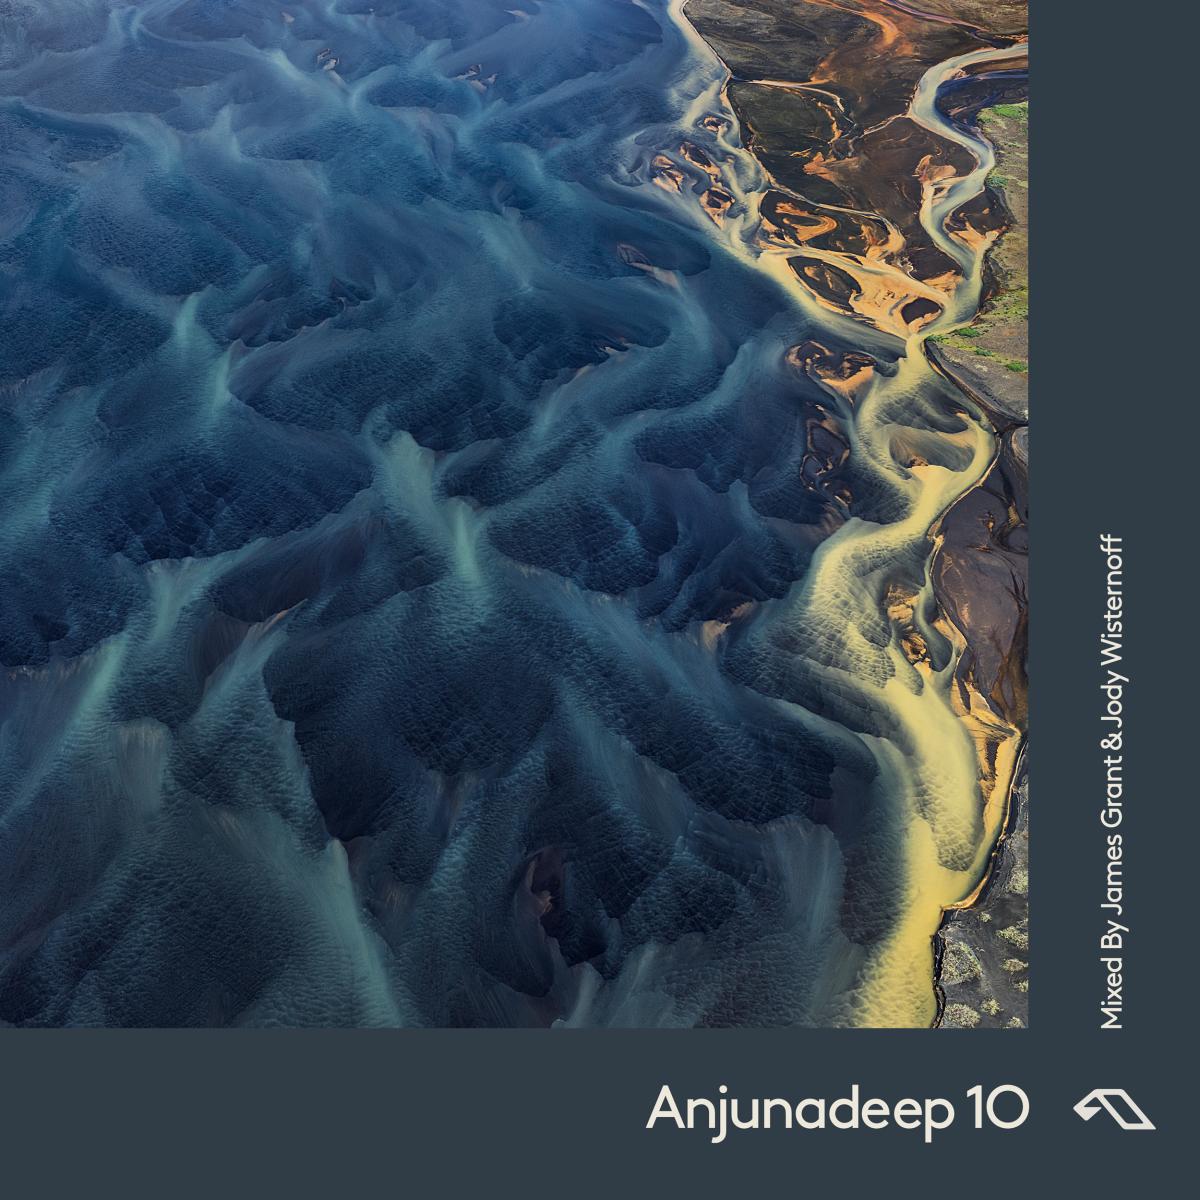 Anjunadeep 10 Cover